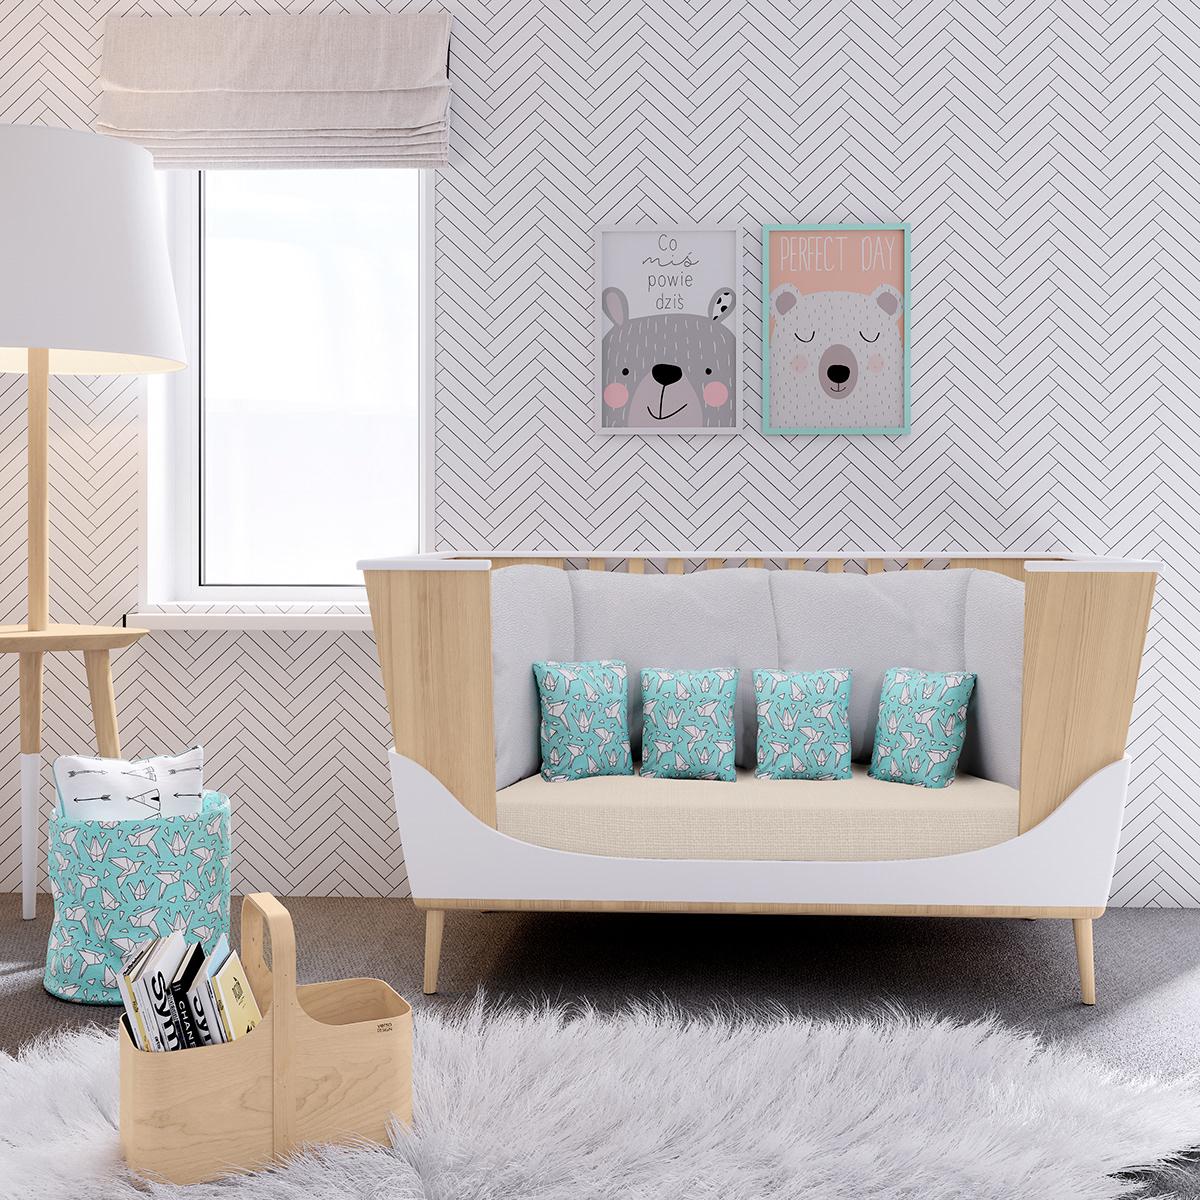 cradle baby furniture micuna sofa Rocker bed product design  cuña Balancin Cama